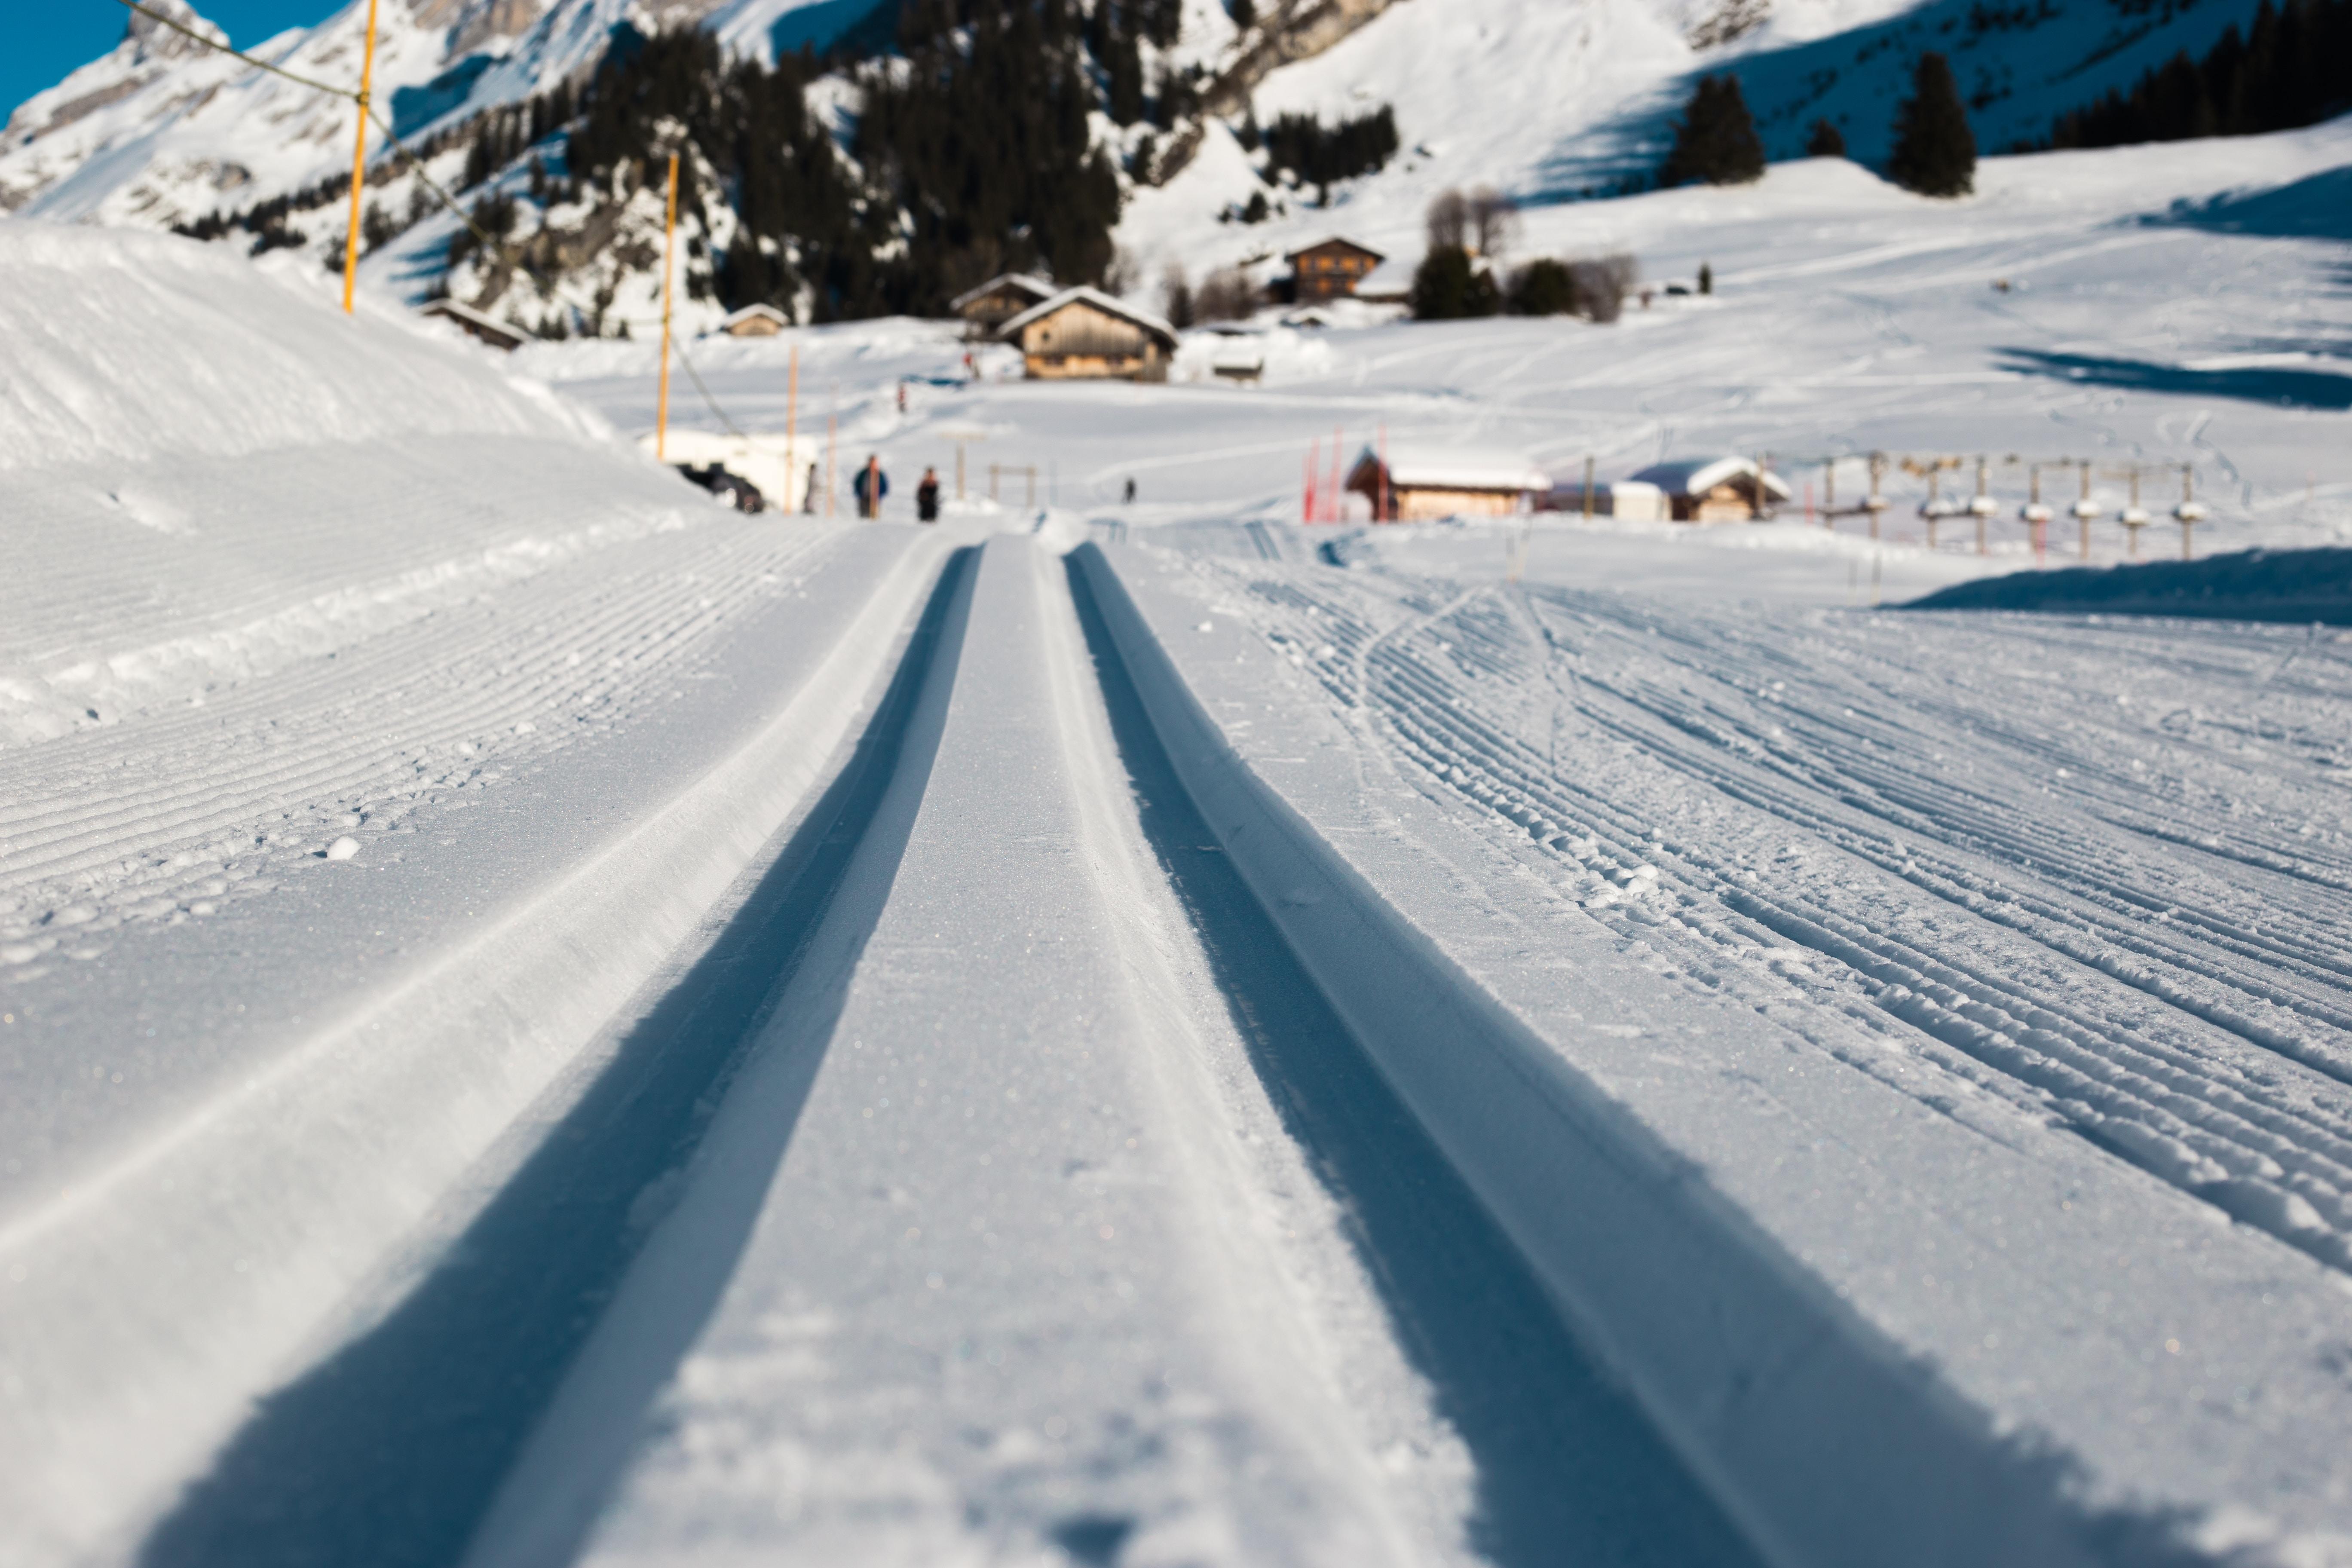 low angle photo of snow